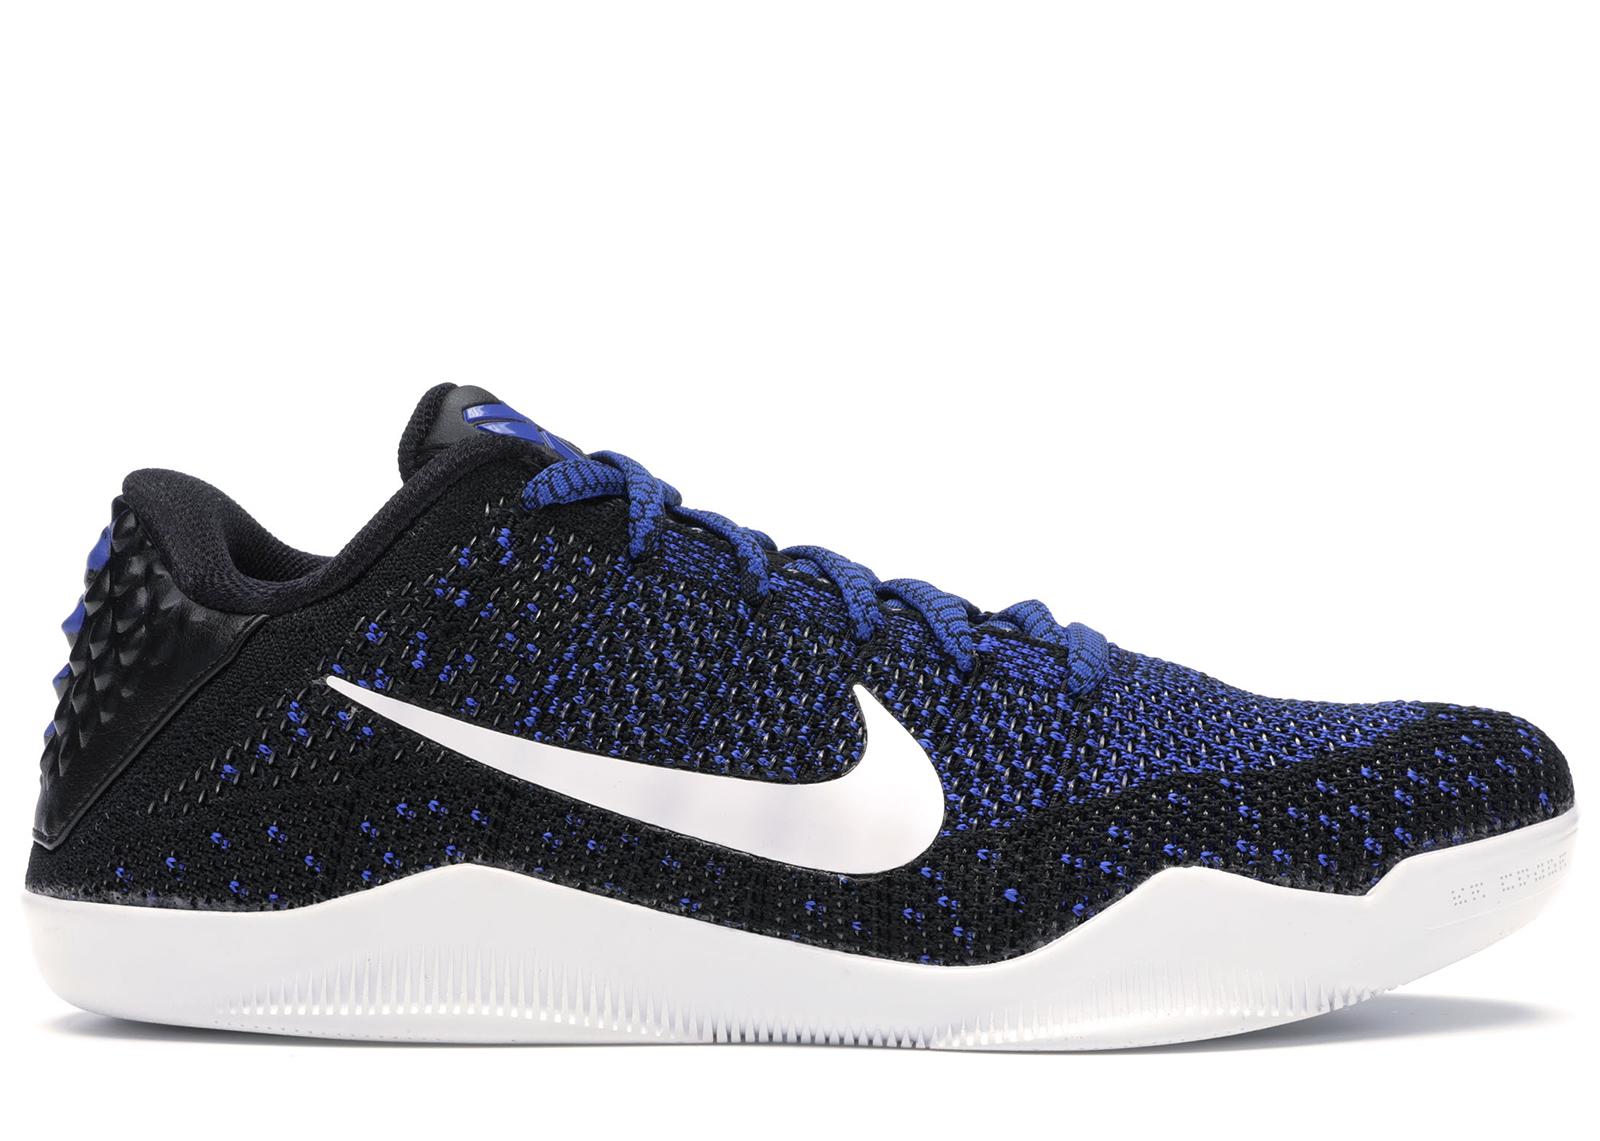 Nike Kobe 11 Elite Low Mark Parker - 822675-014